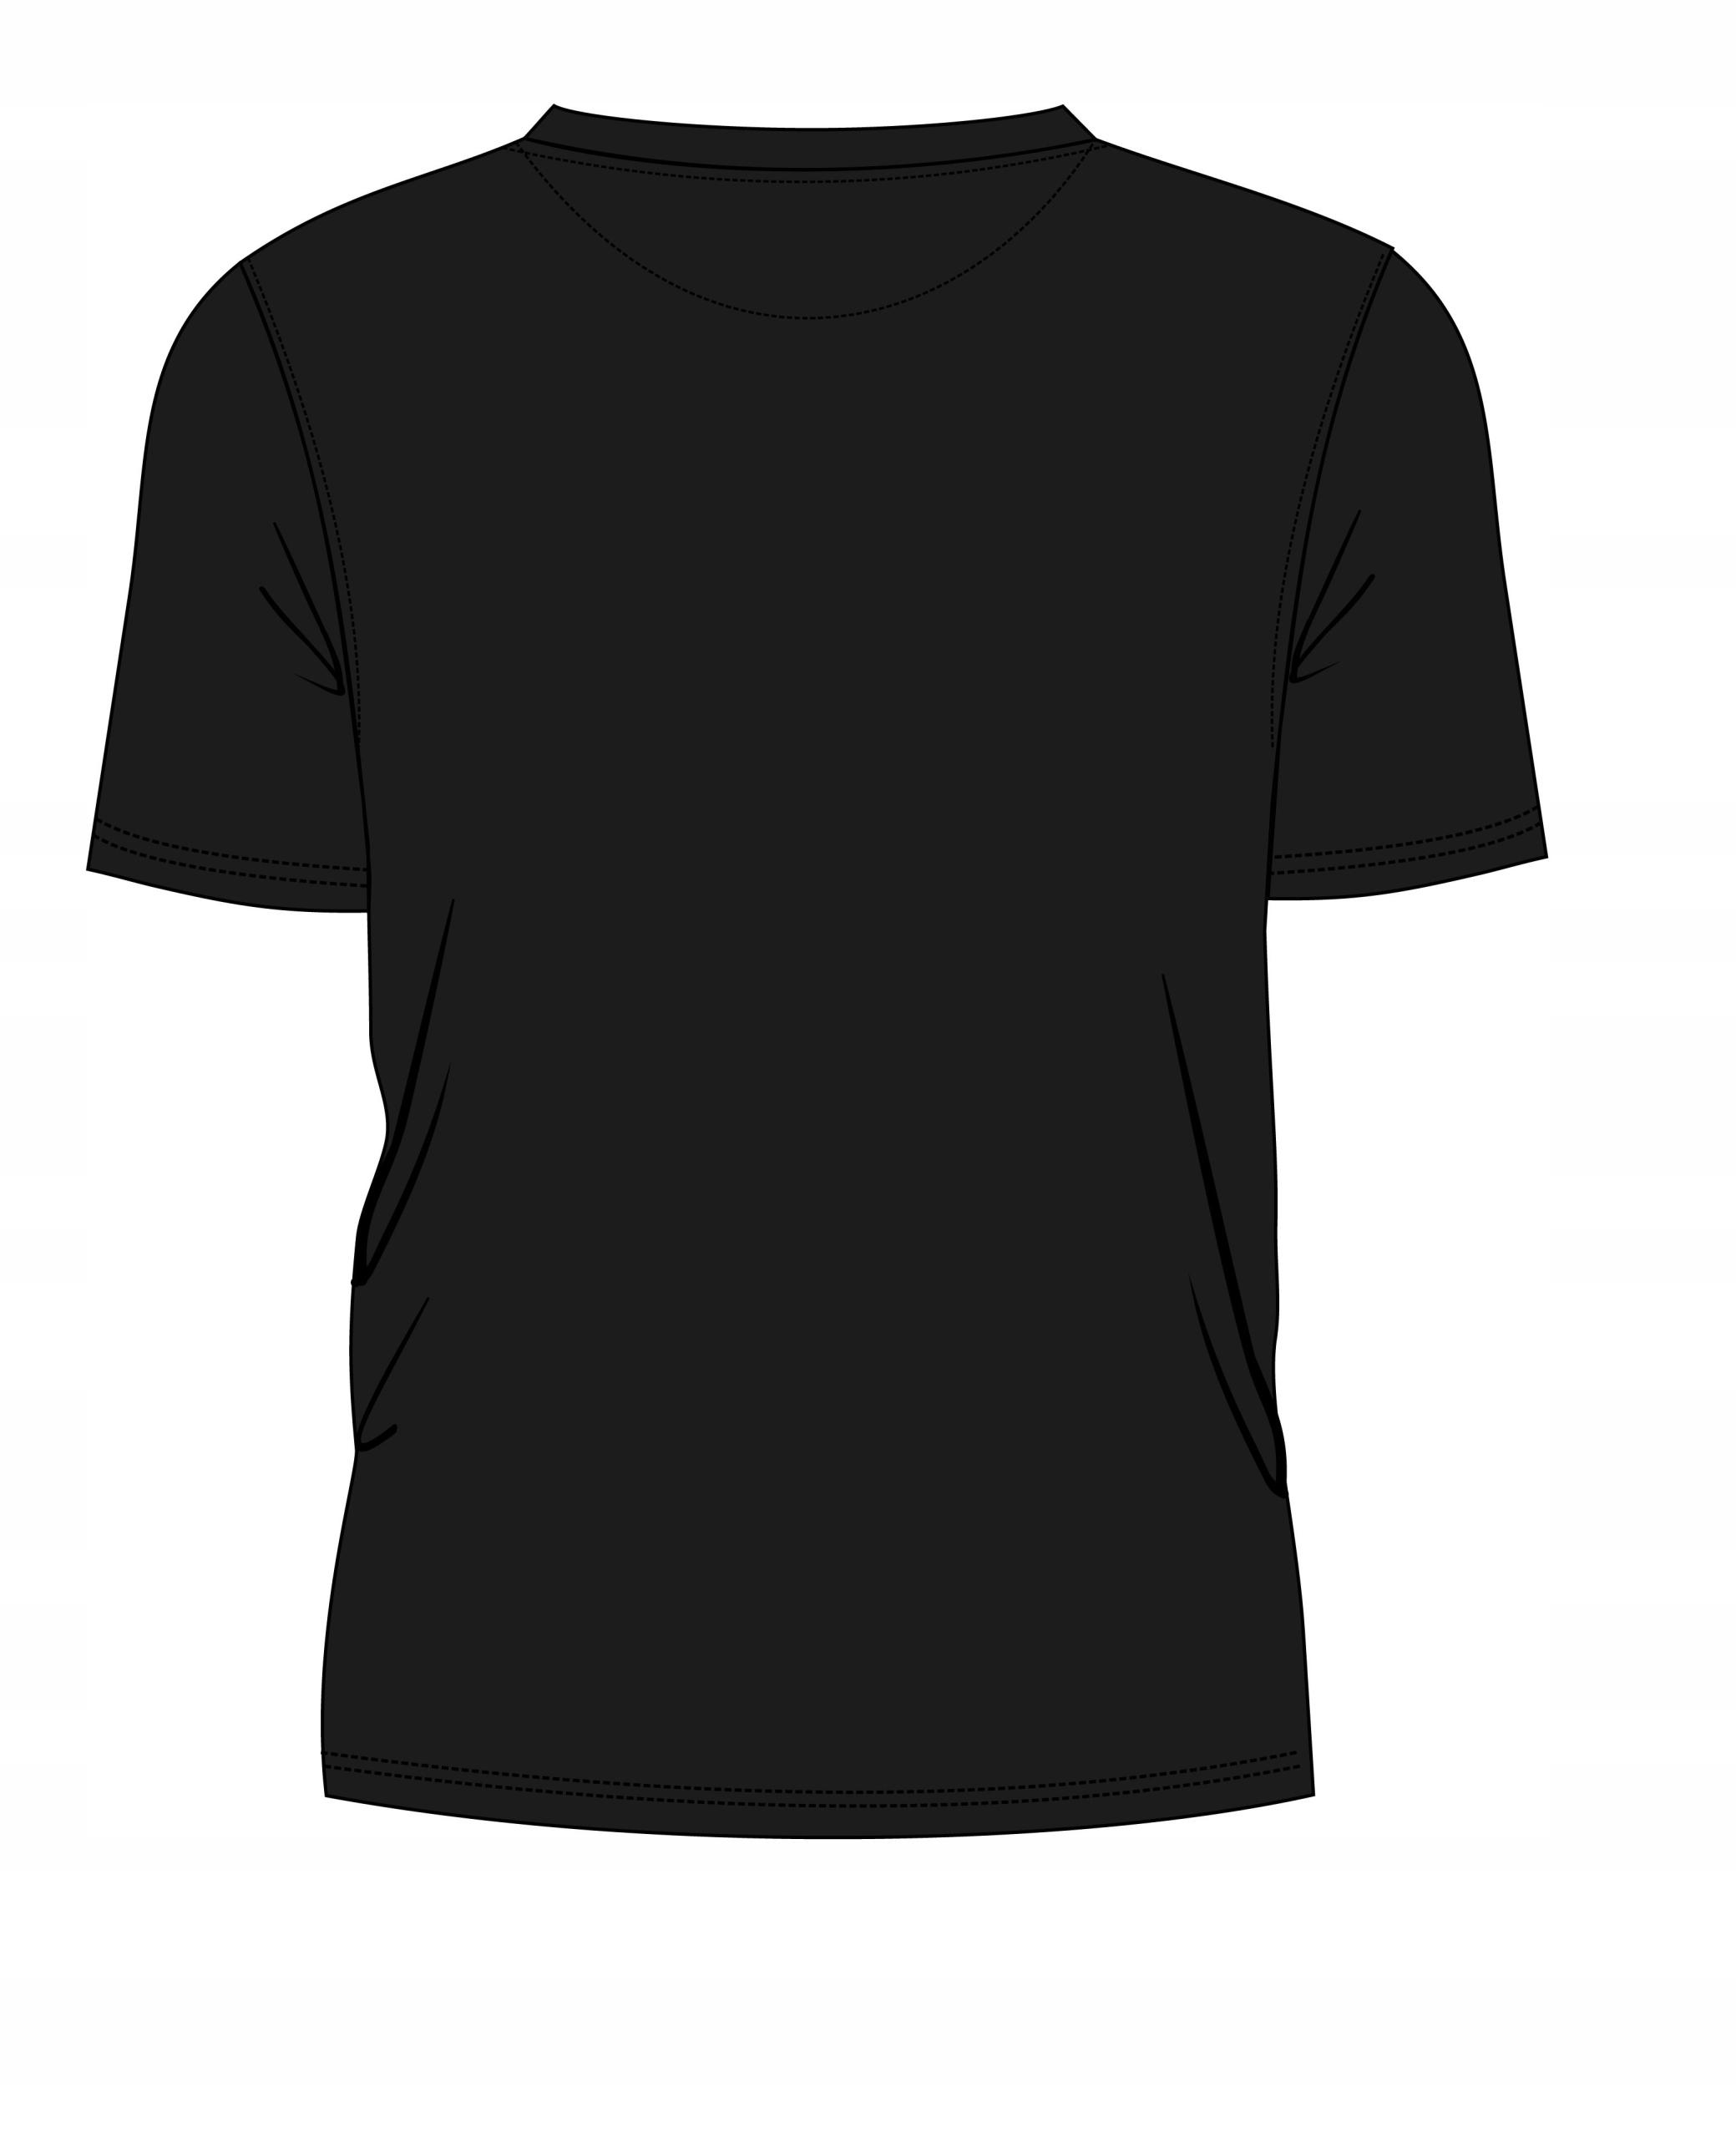 a4e4ffe69 Koszulka PROSTO TS KL CITY black M - 7700805477 - oficjalne archiwum ...